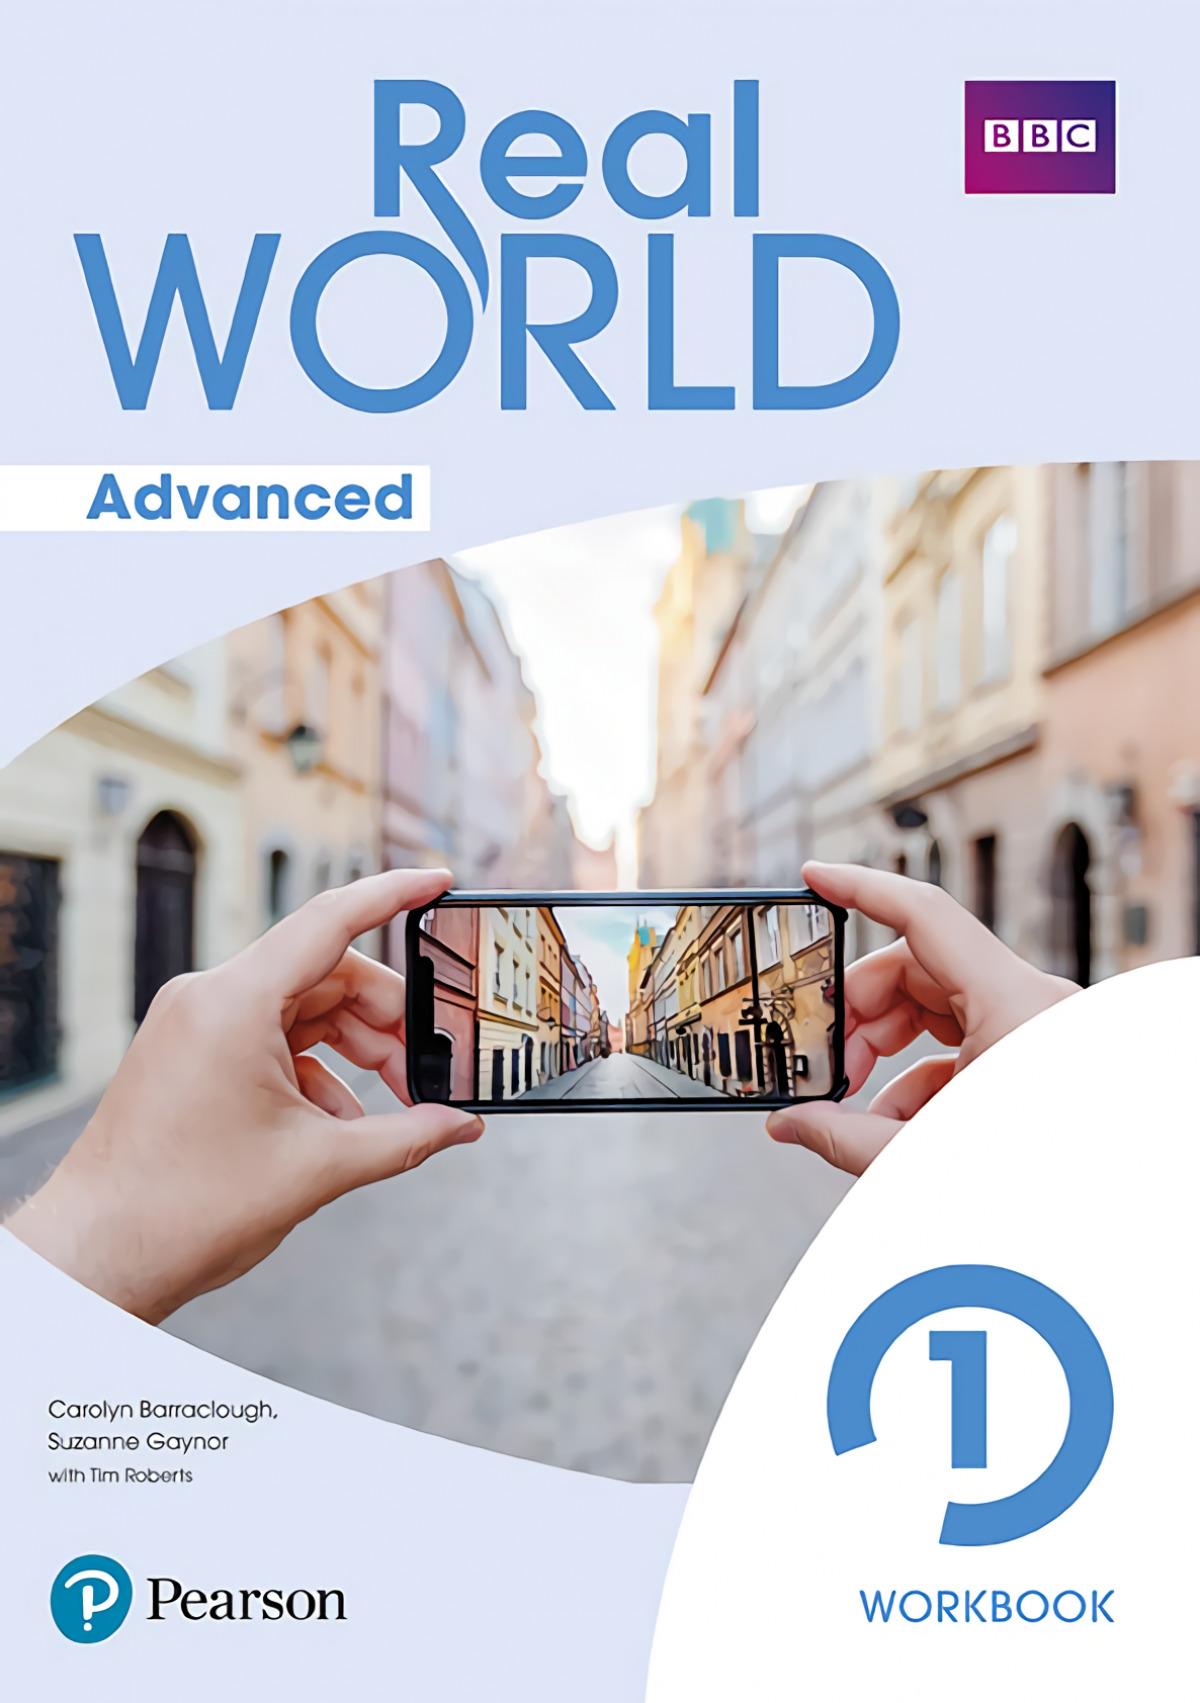 Real World Advanced 1 Workbook Print